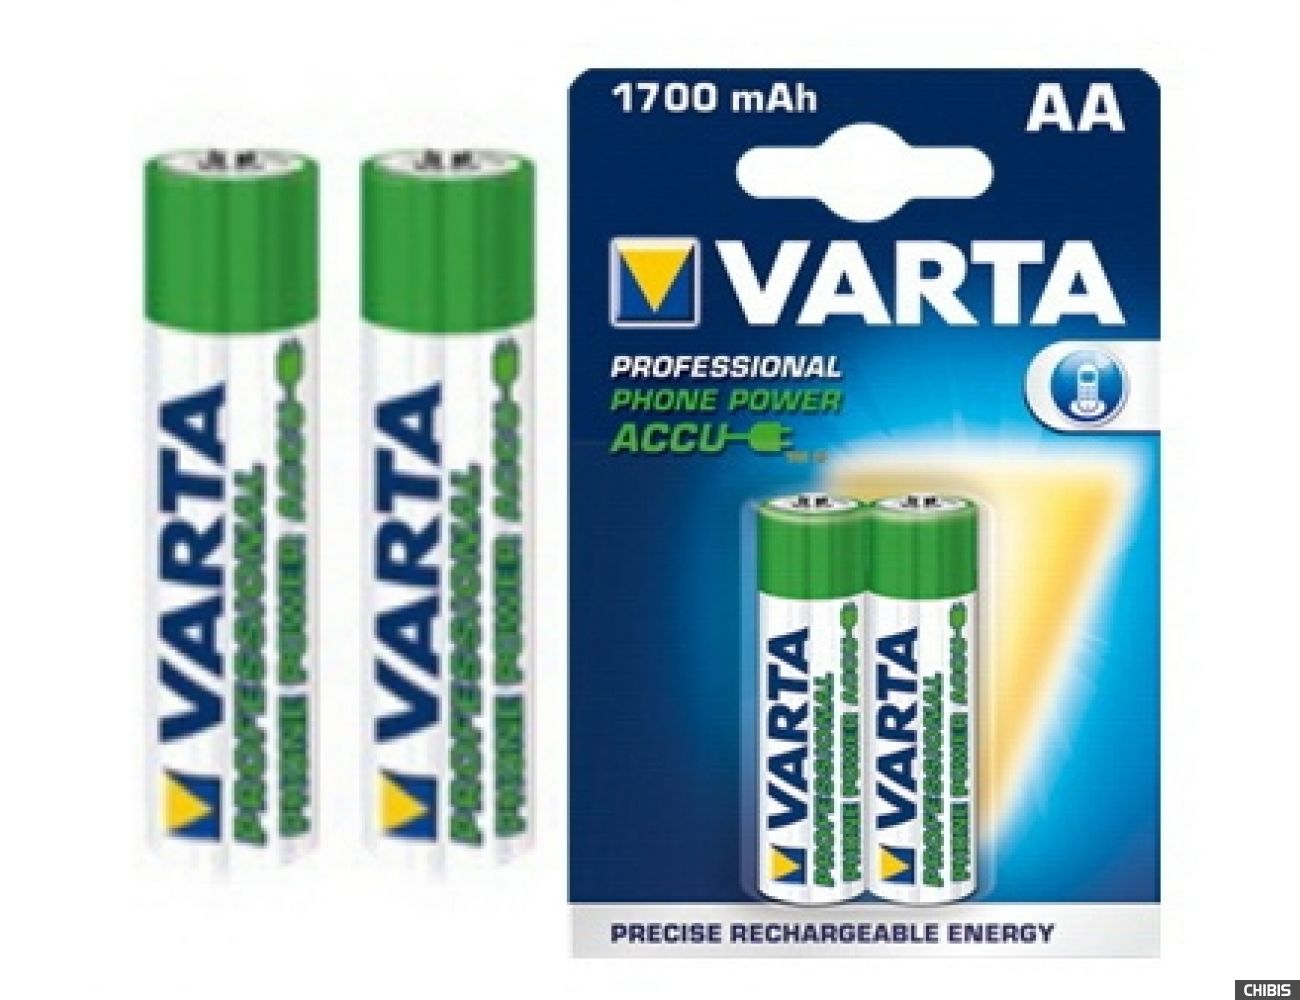 Аккумуляторные батарейки АА Varta 1700 mAh Professional Phone Power (HR6, 1700mAh, 1.2V, Ni-Mh) 58399201402